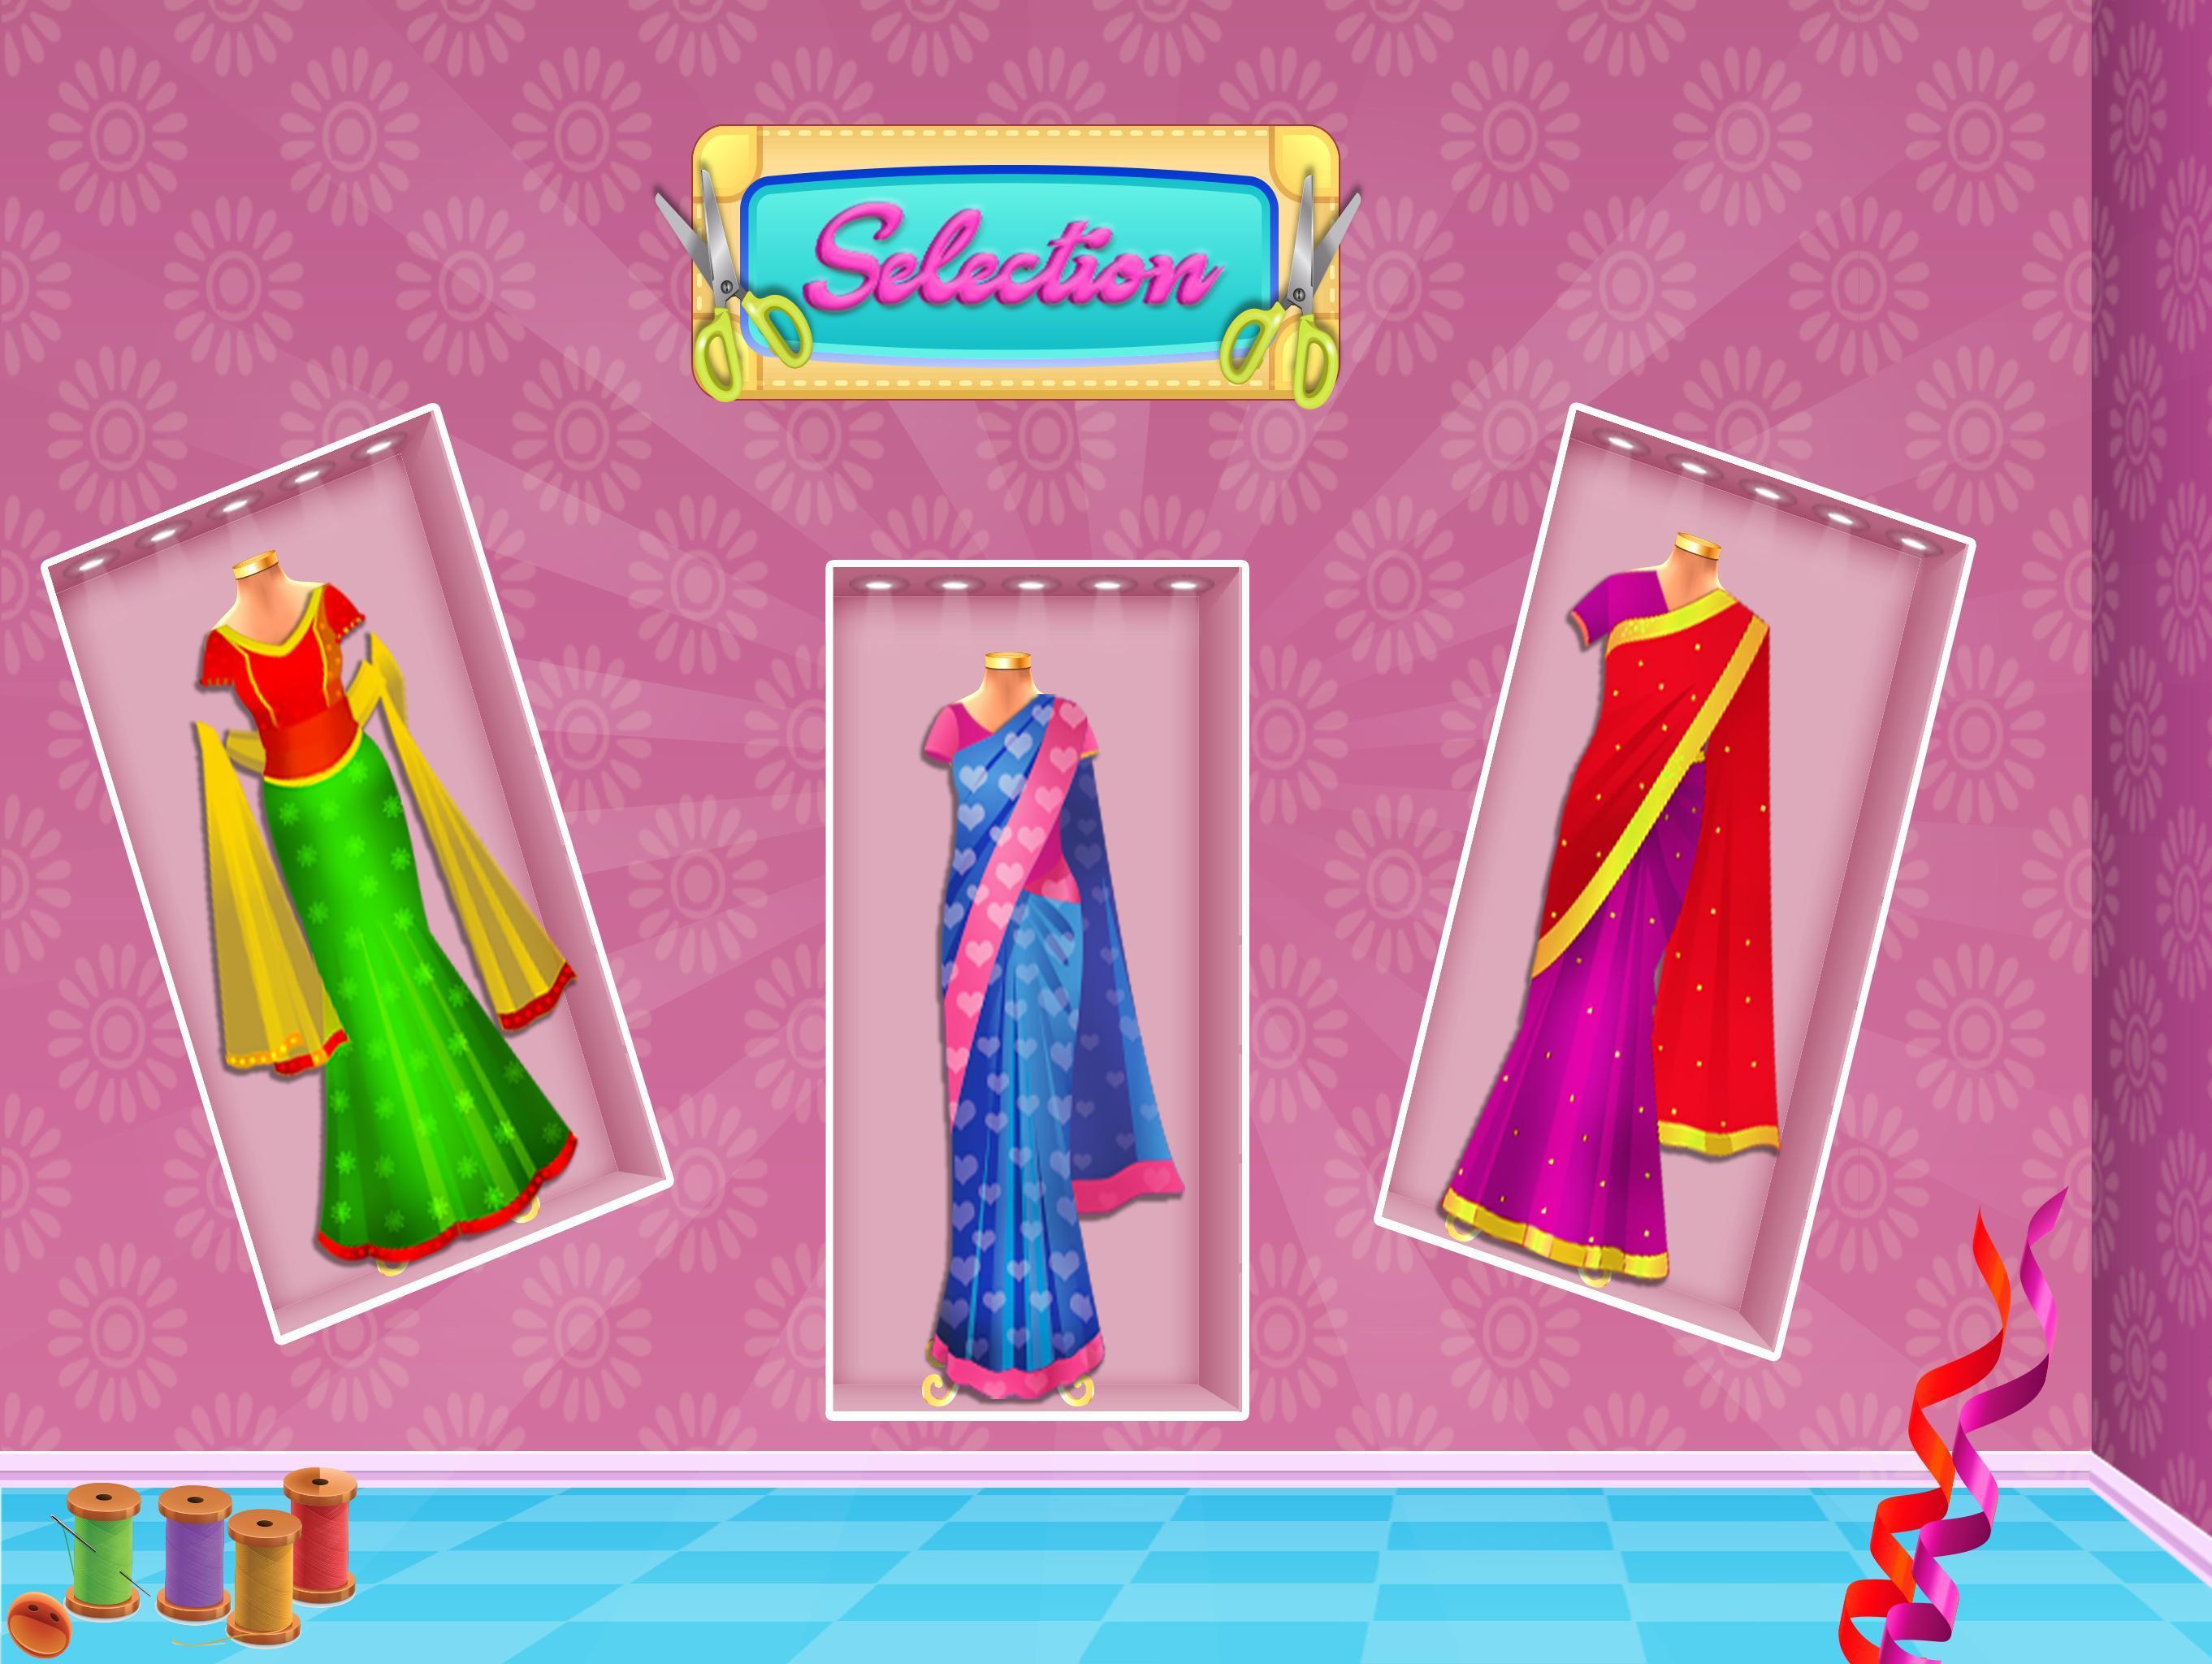 Indian Wedding Dress Tailor Little Style Boutique 1.0.4 Screenshot 6